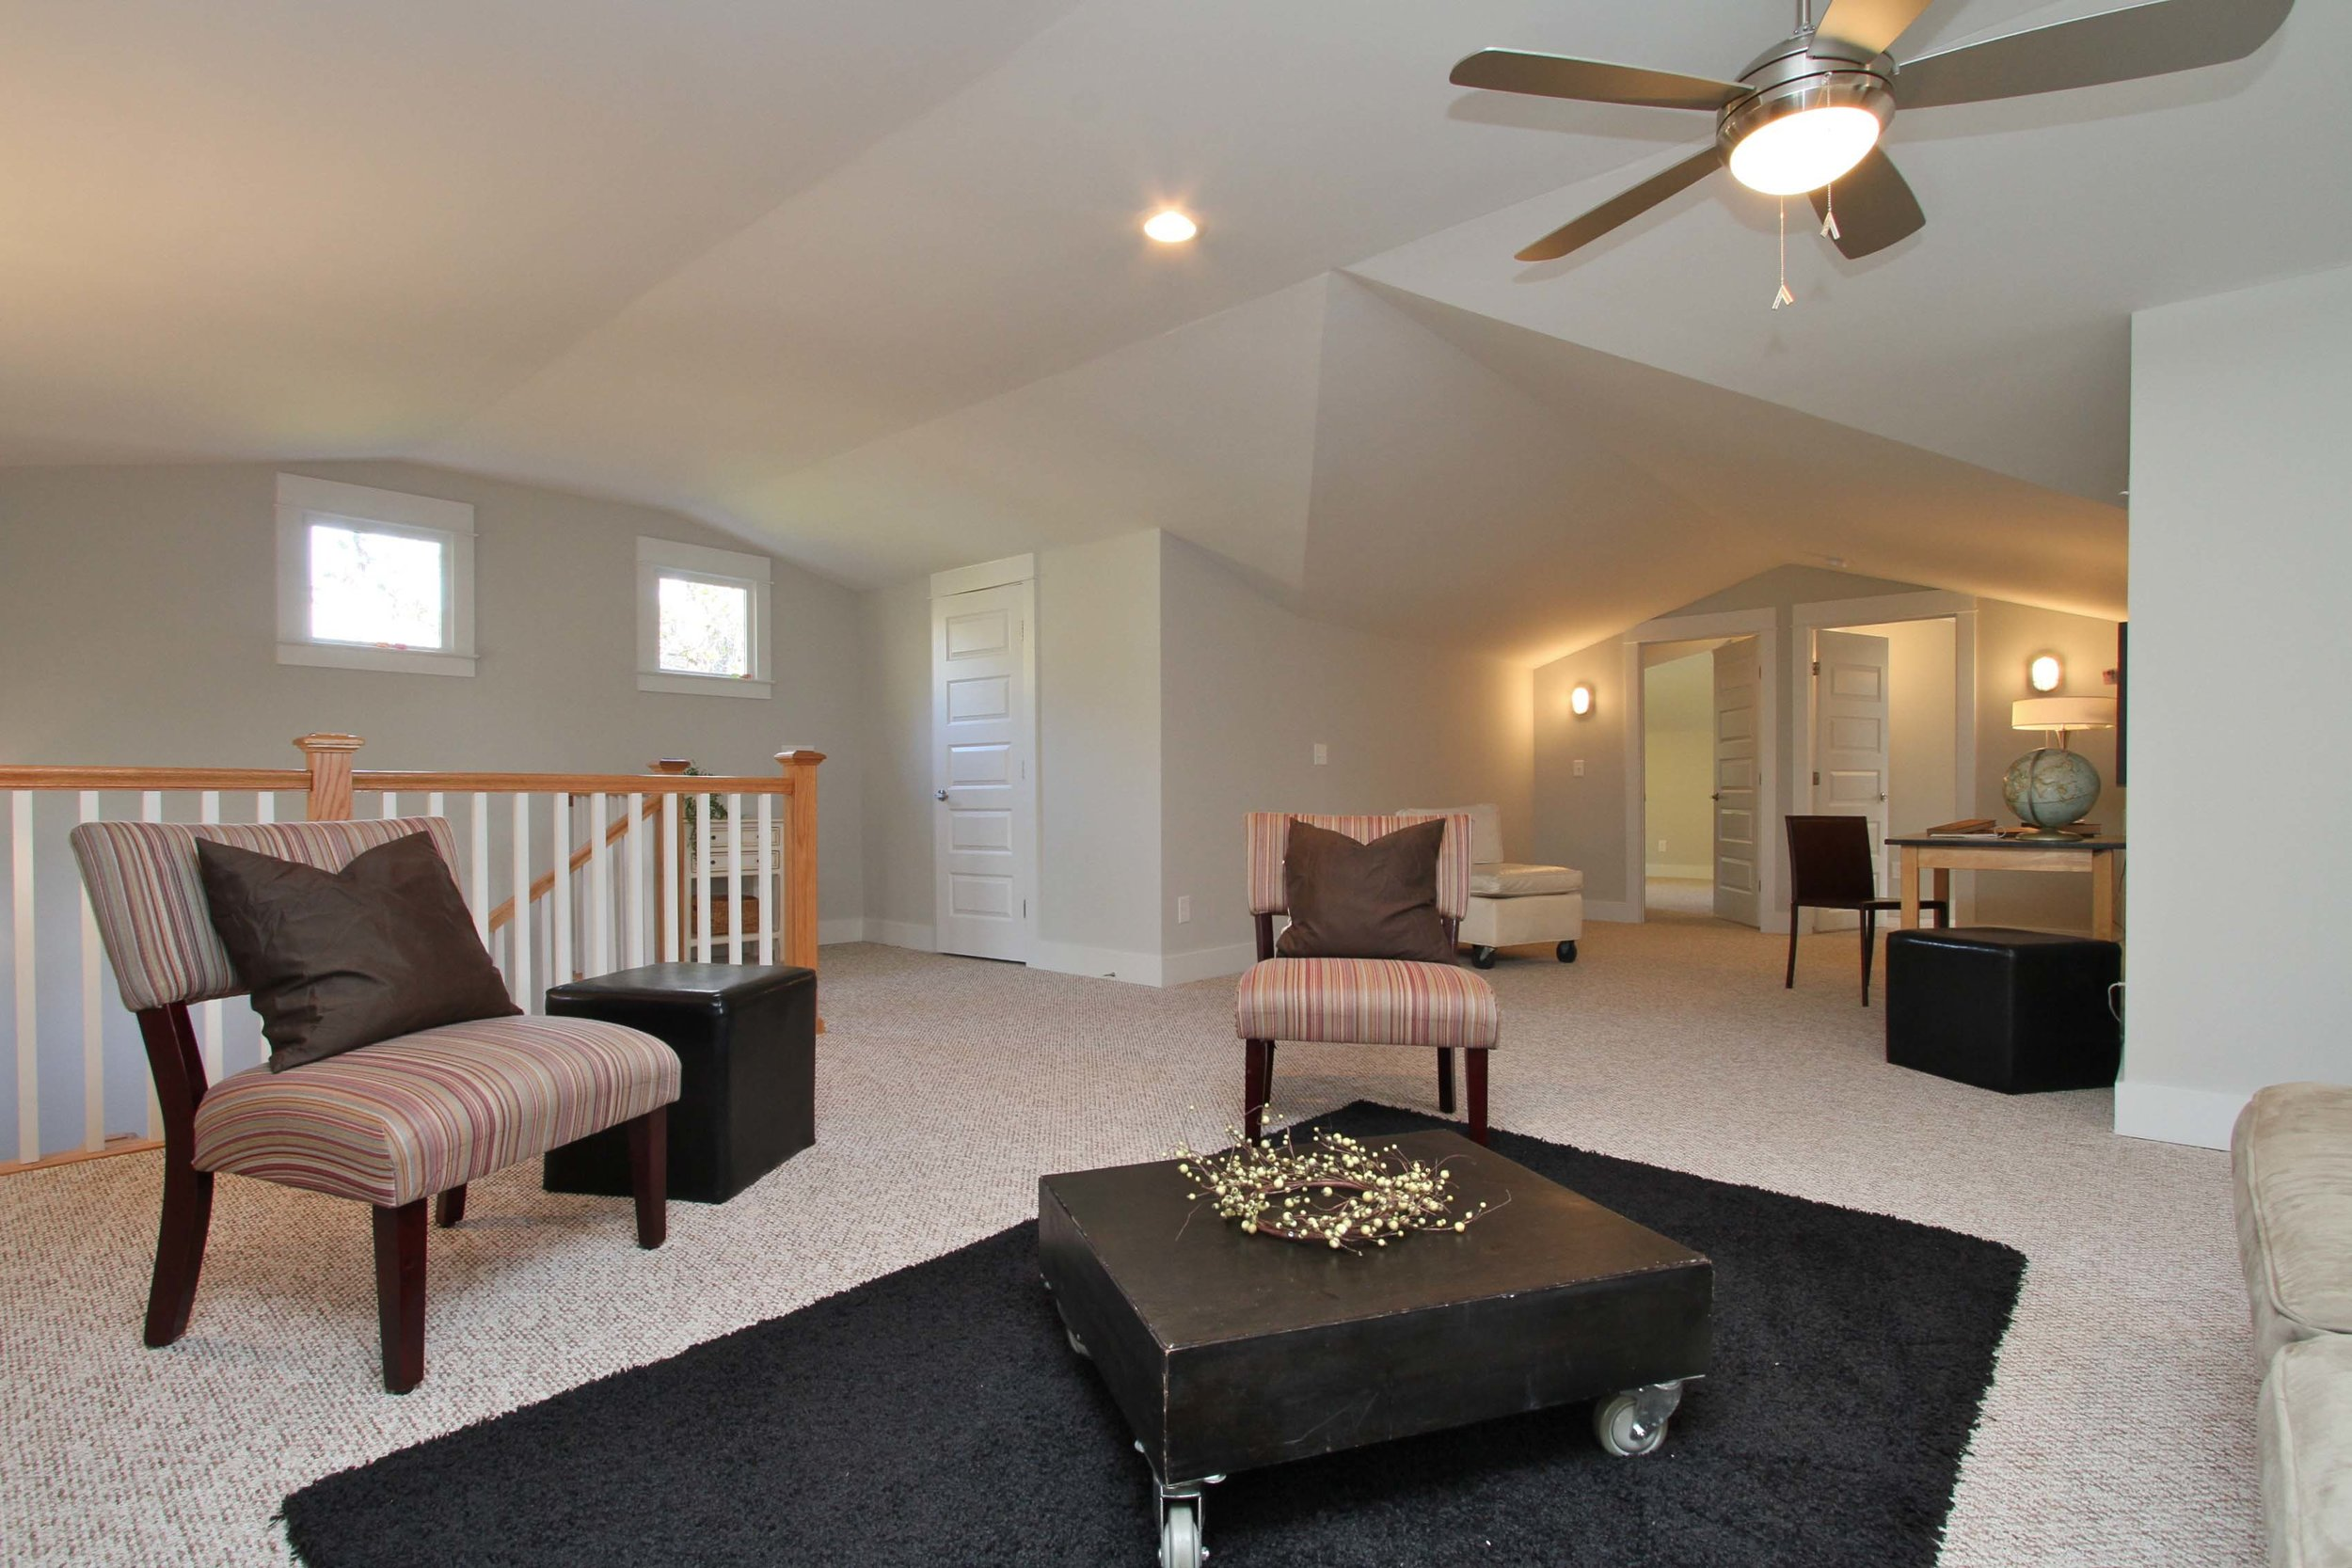 House-Plans-Online-Historic-Nashville-Peggy-Newman-Renovation-Bonus-Murphy.jpg